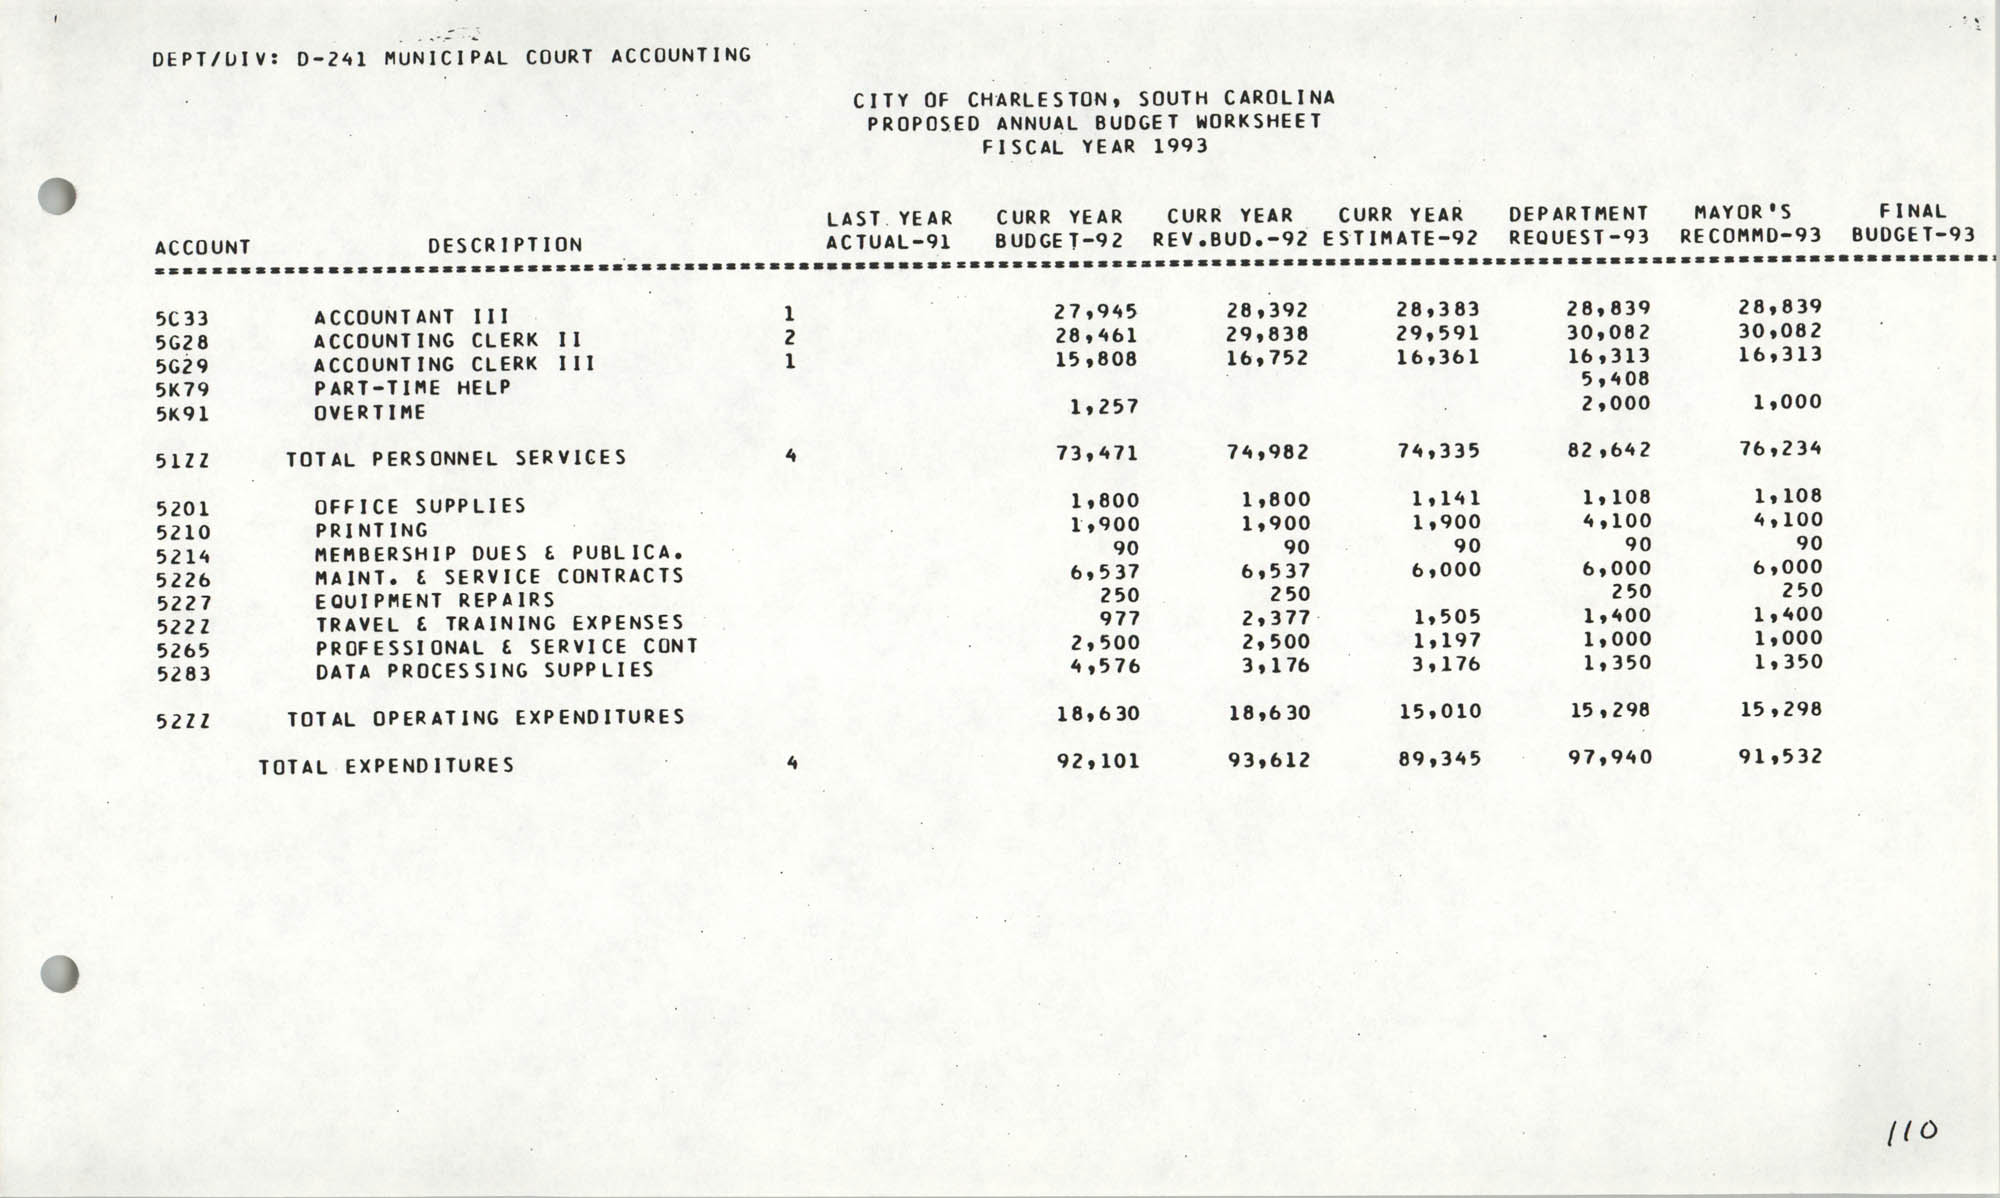 The City Council of Charleston, South Carolina, 1993 Budget, Page 110